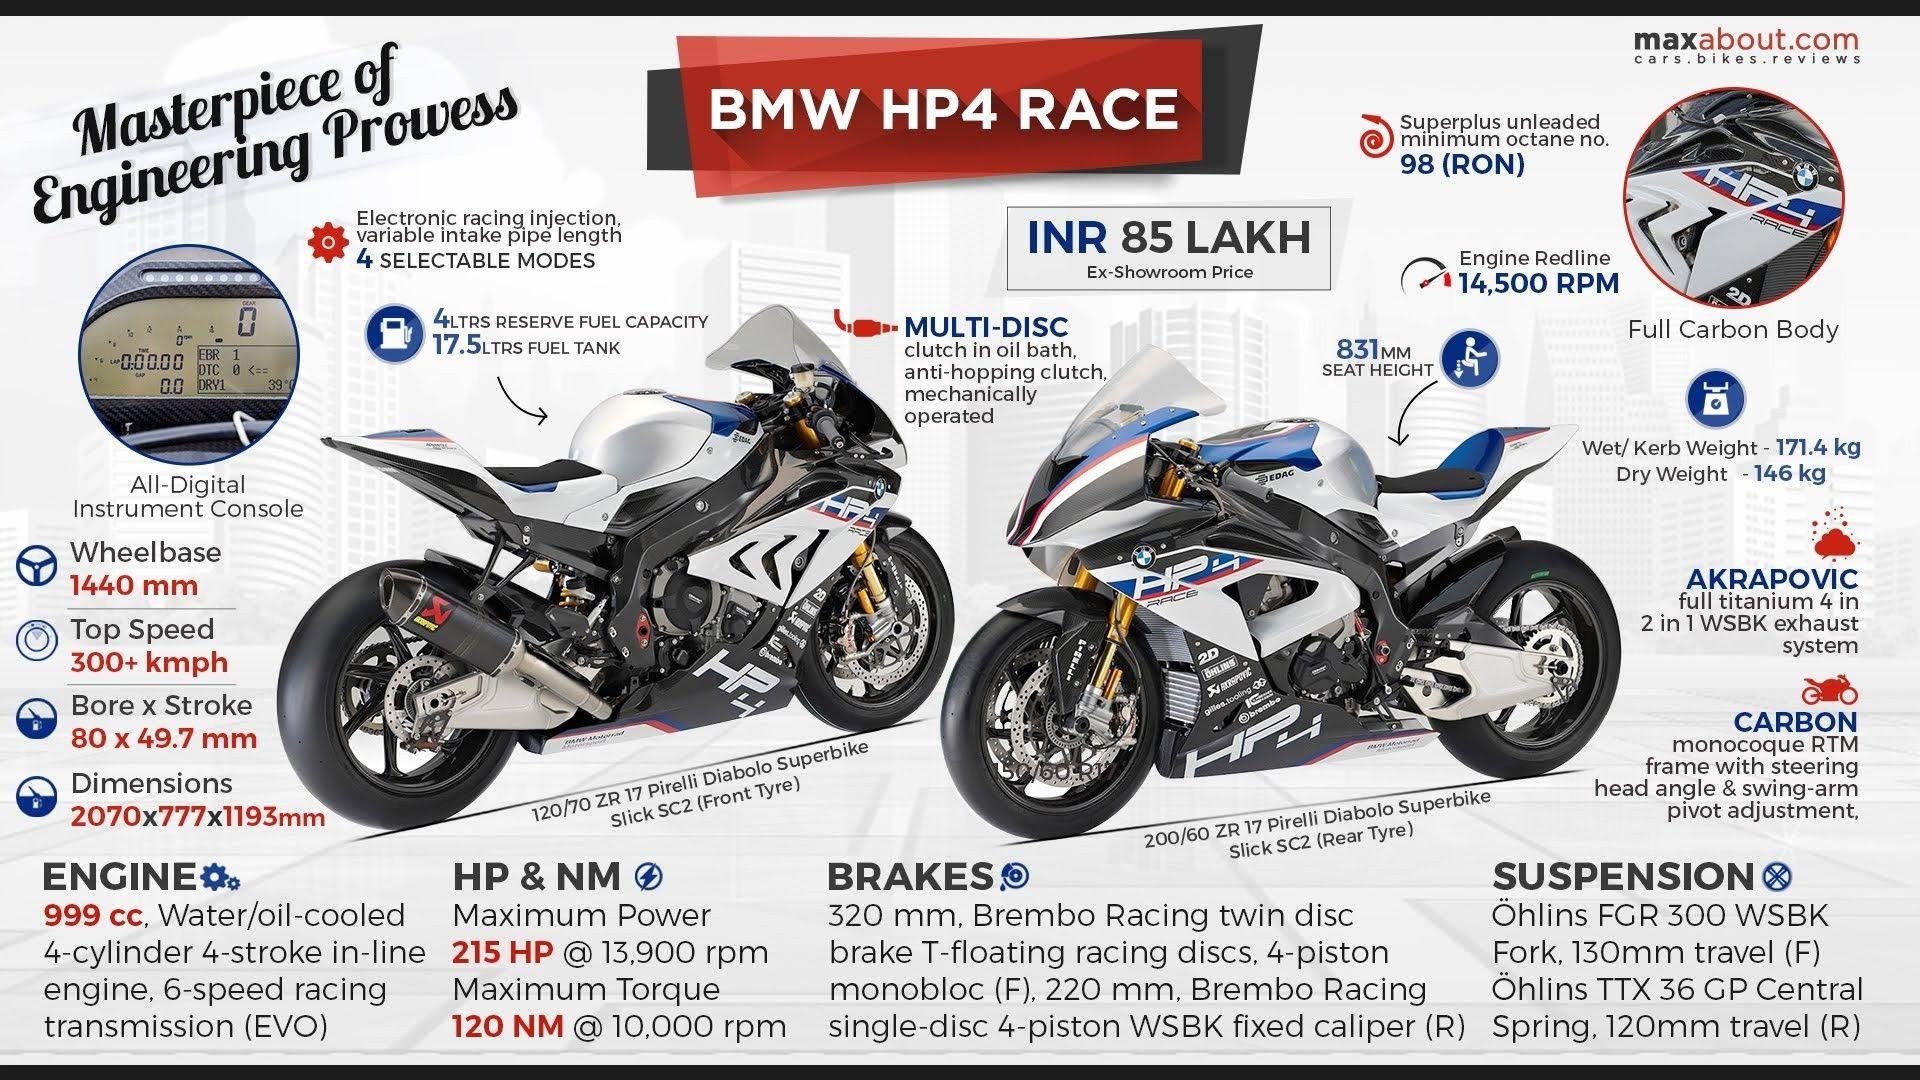 Pin By Prikshitsaini On Bikes Infographic Racing Sport Bikes Bmw